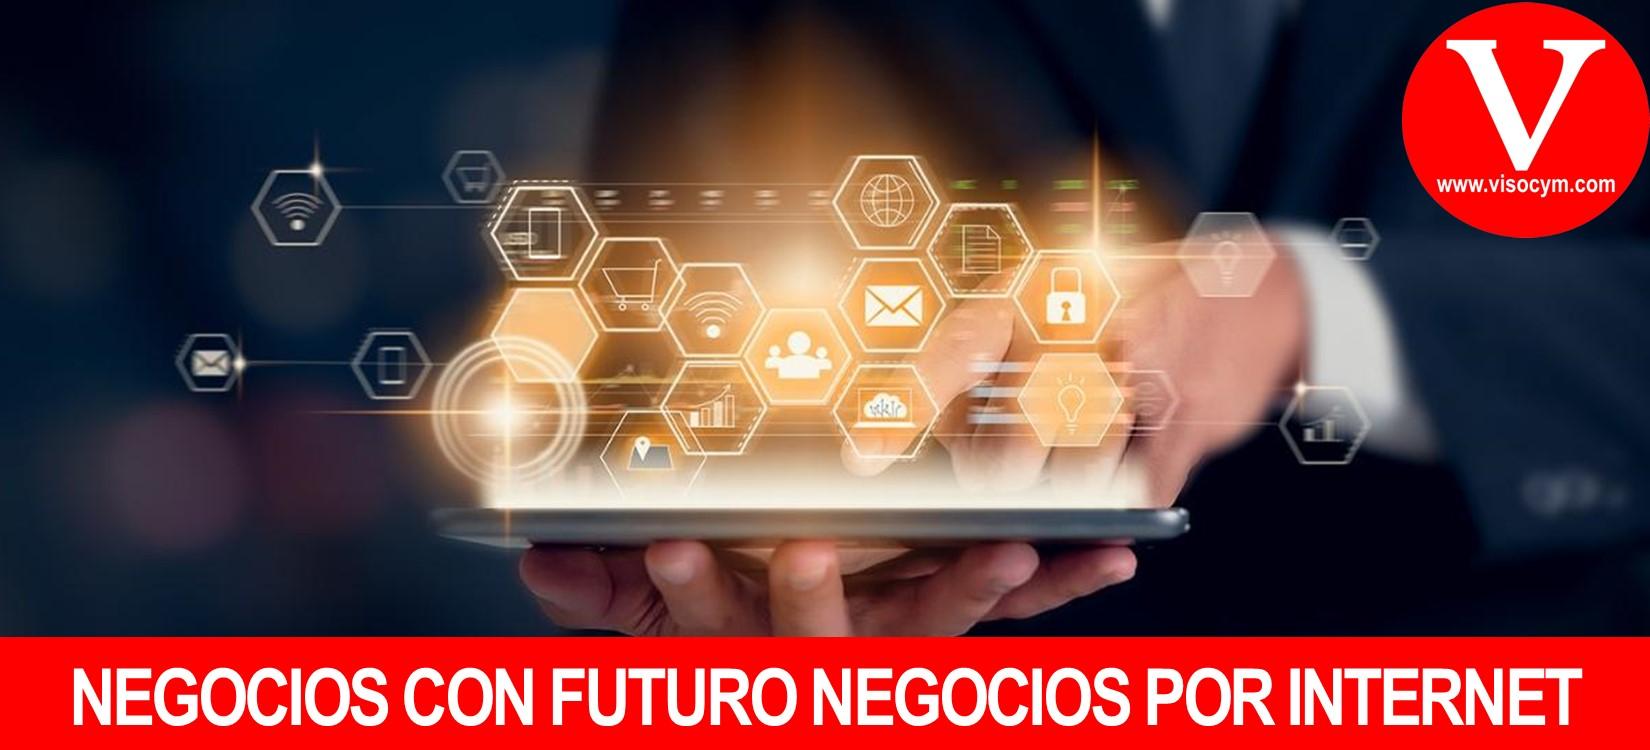 Negocios con Futuro, Negocios por Internet